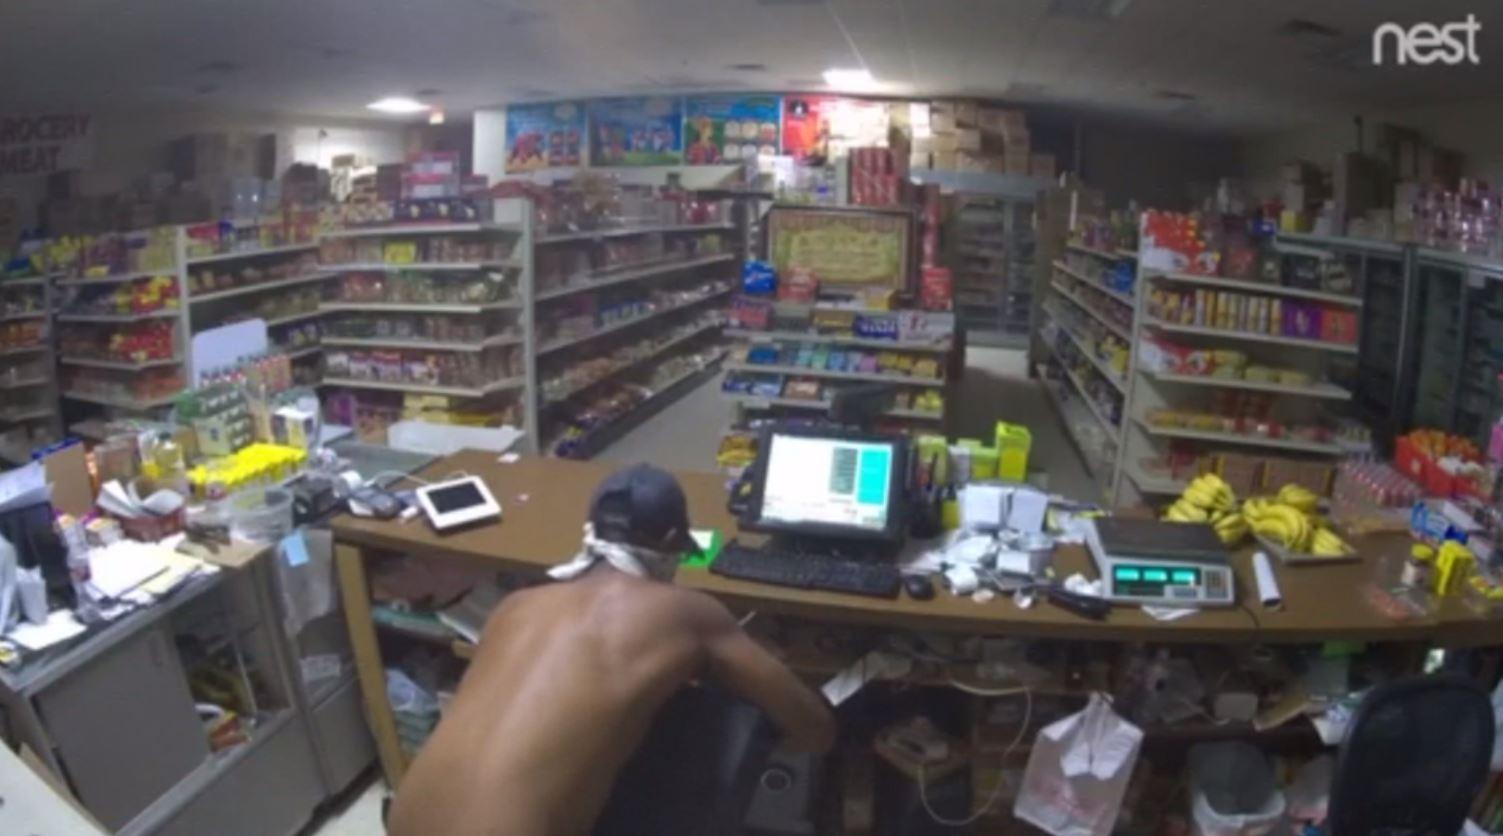 Indo Pak Supermarket Burglary Suspect, Round Rock_553850